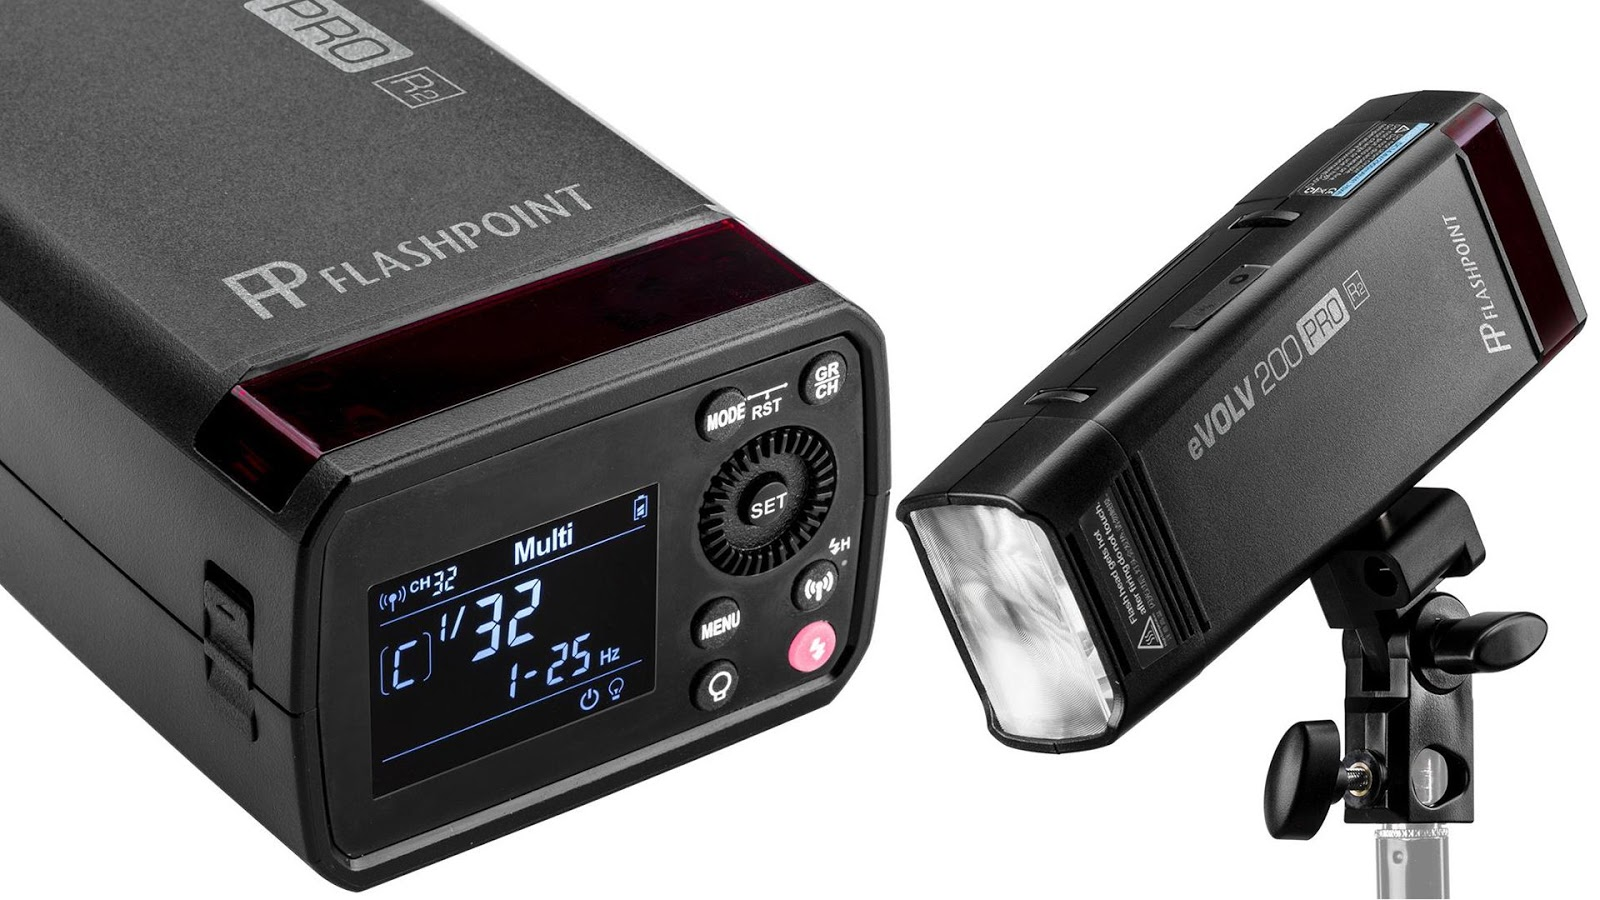 Flashpoint eVOLV 200 Pro (Godox AD200 Pro)